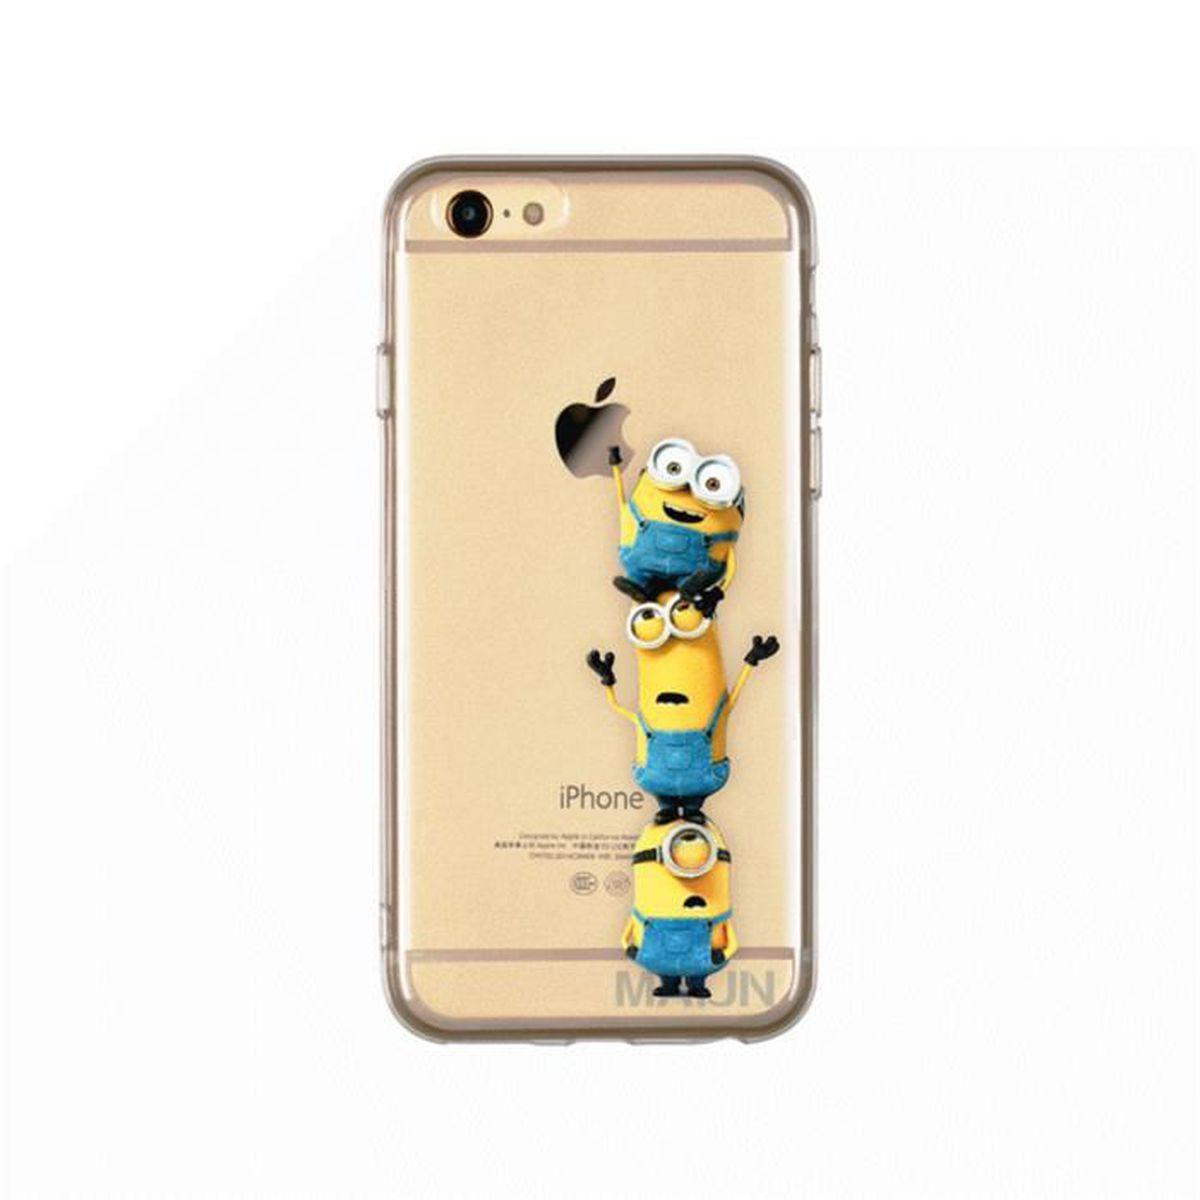 COQUE - BUMPER Coque pour Apple iPhone 5 / 5S / SE Minions moi Mo